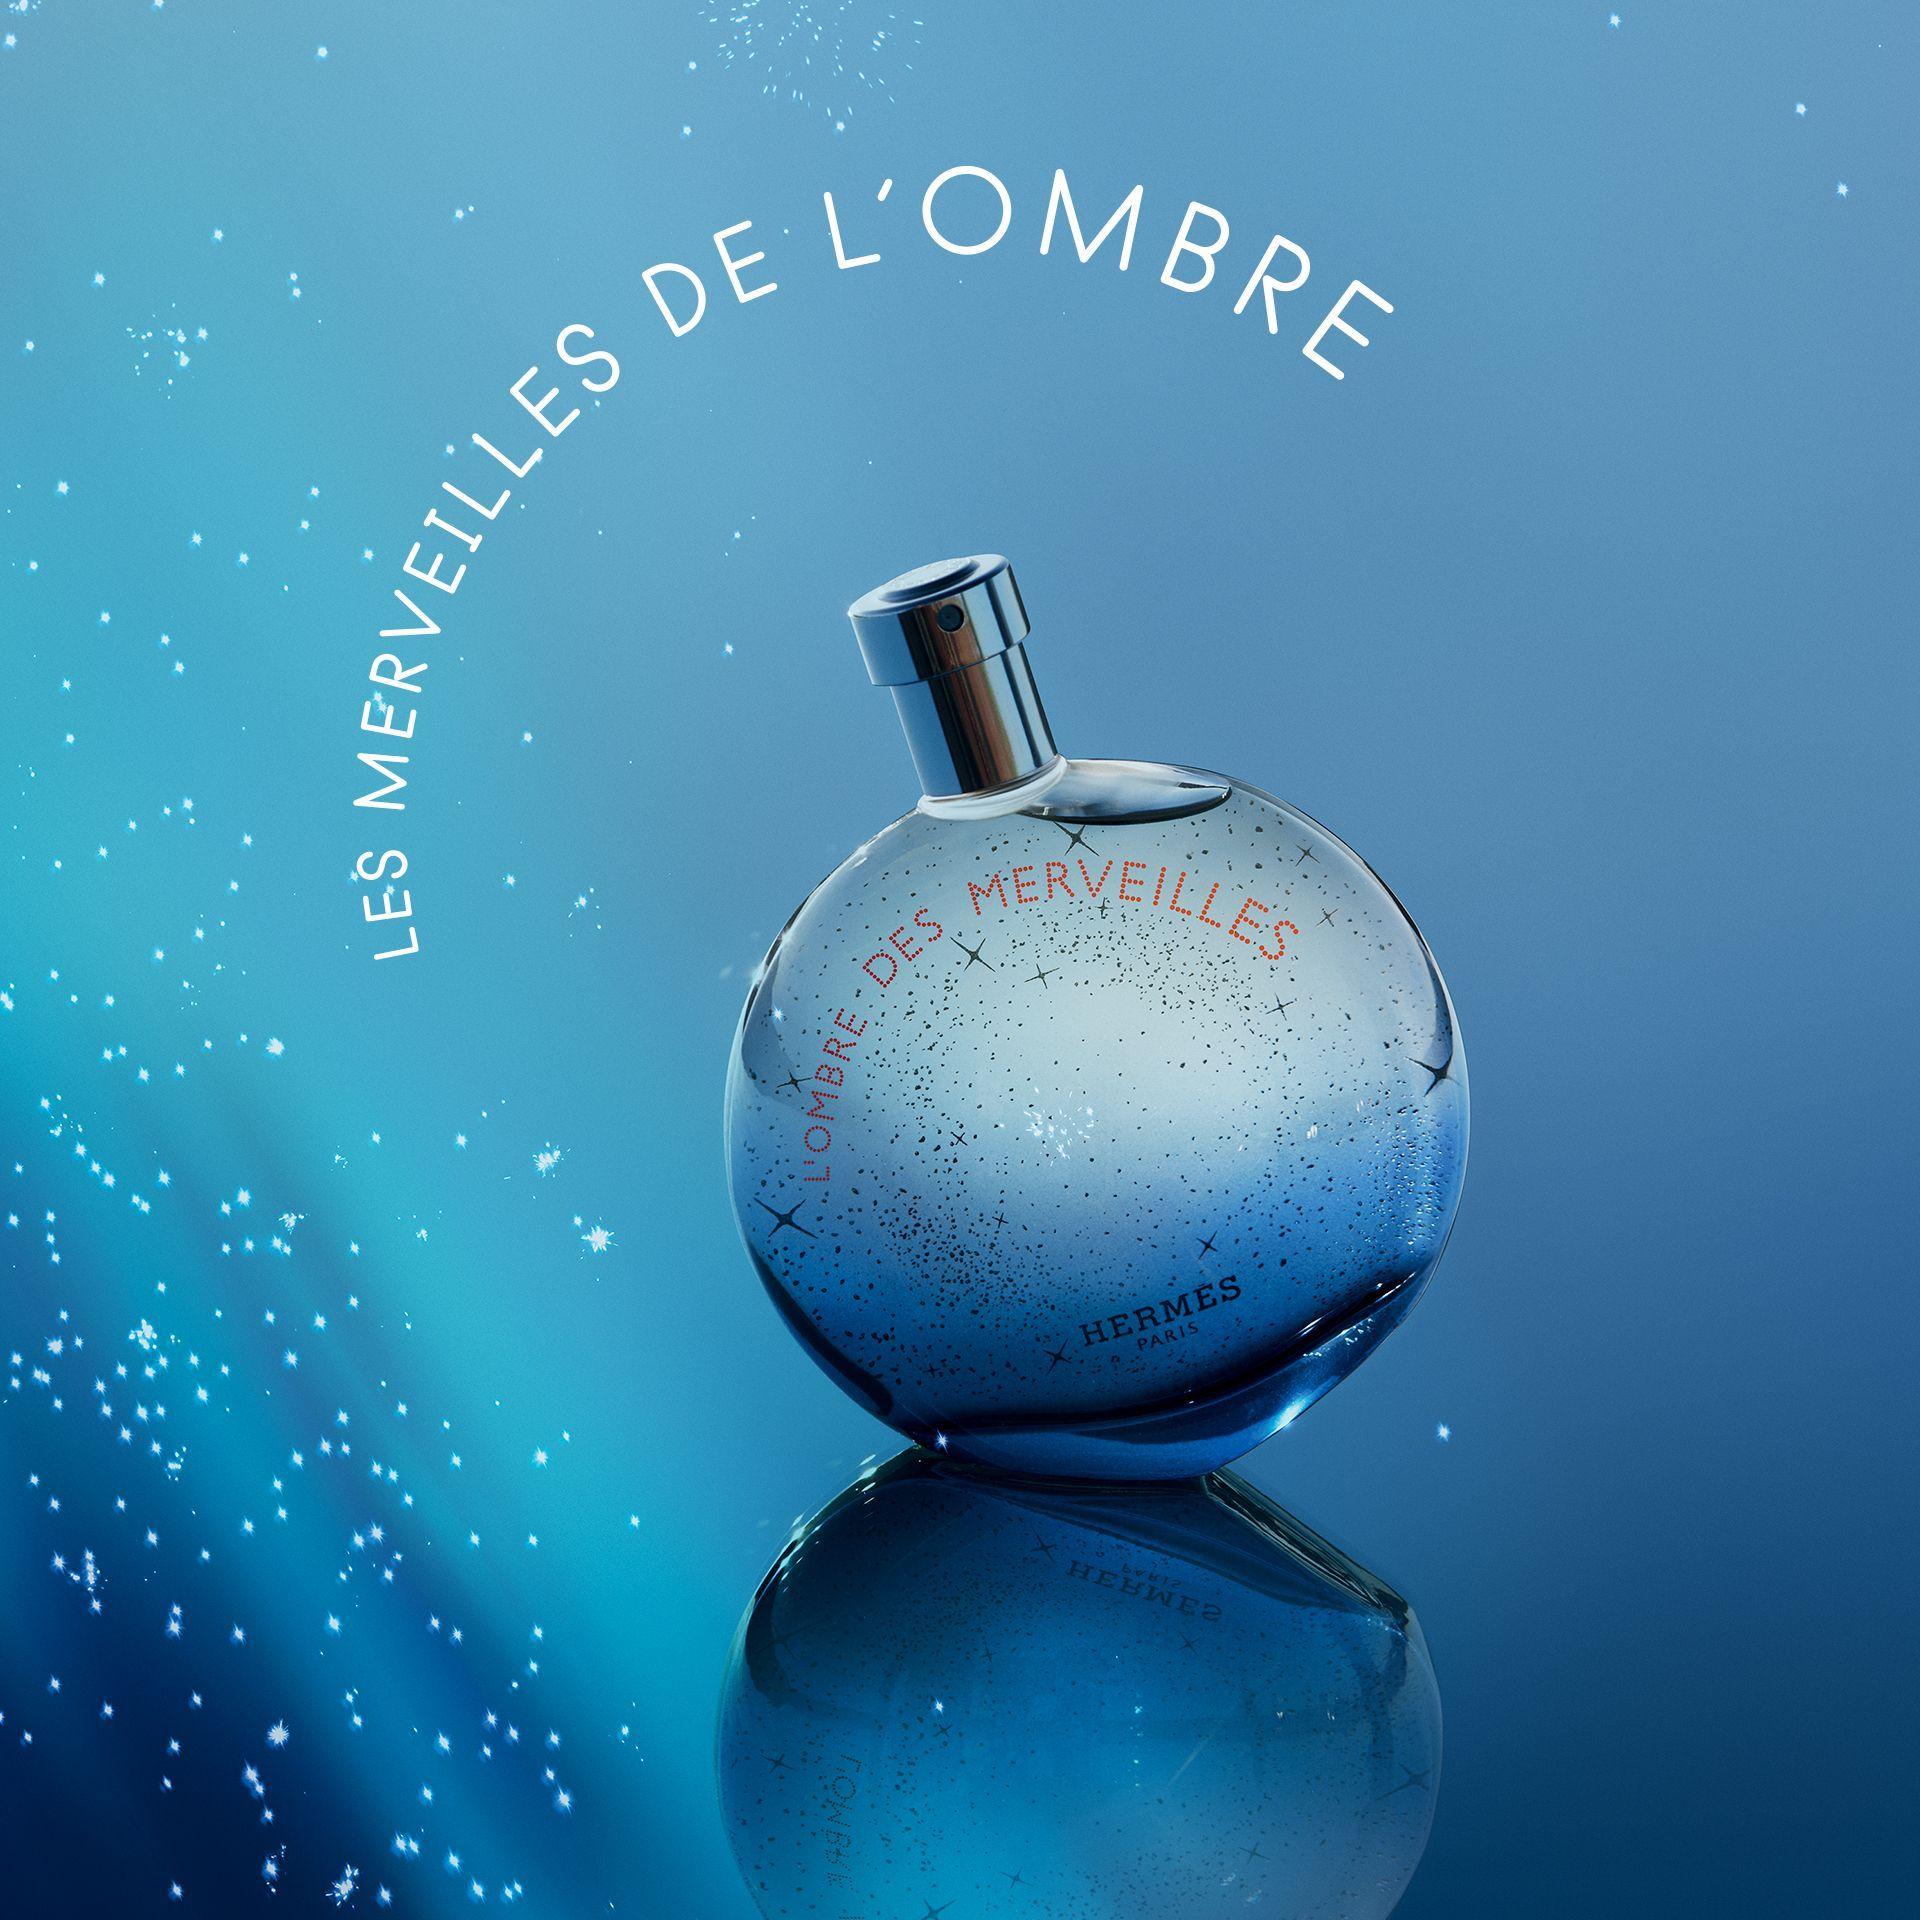 Pry Into The Fantastical World of Hermès Through The New L'Ombre Des Merveilles